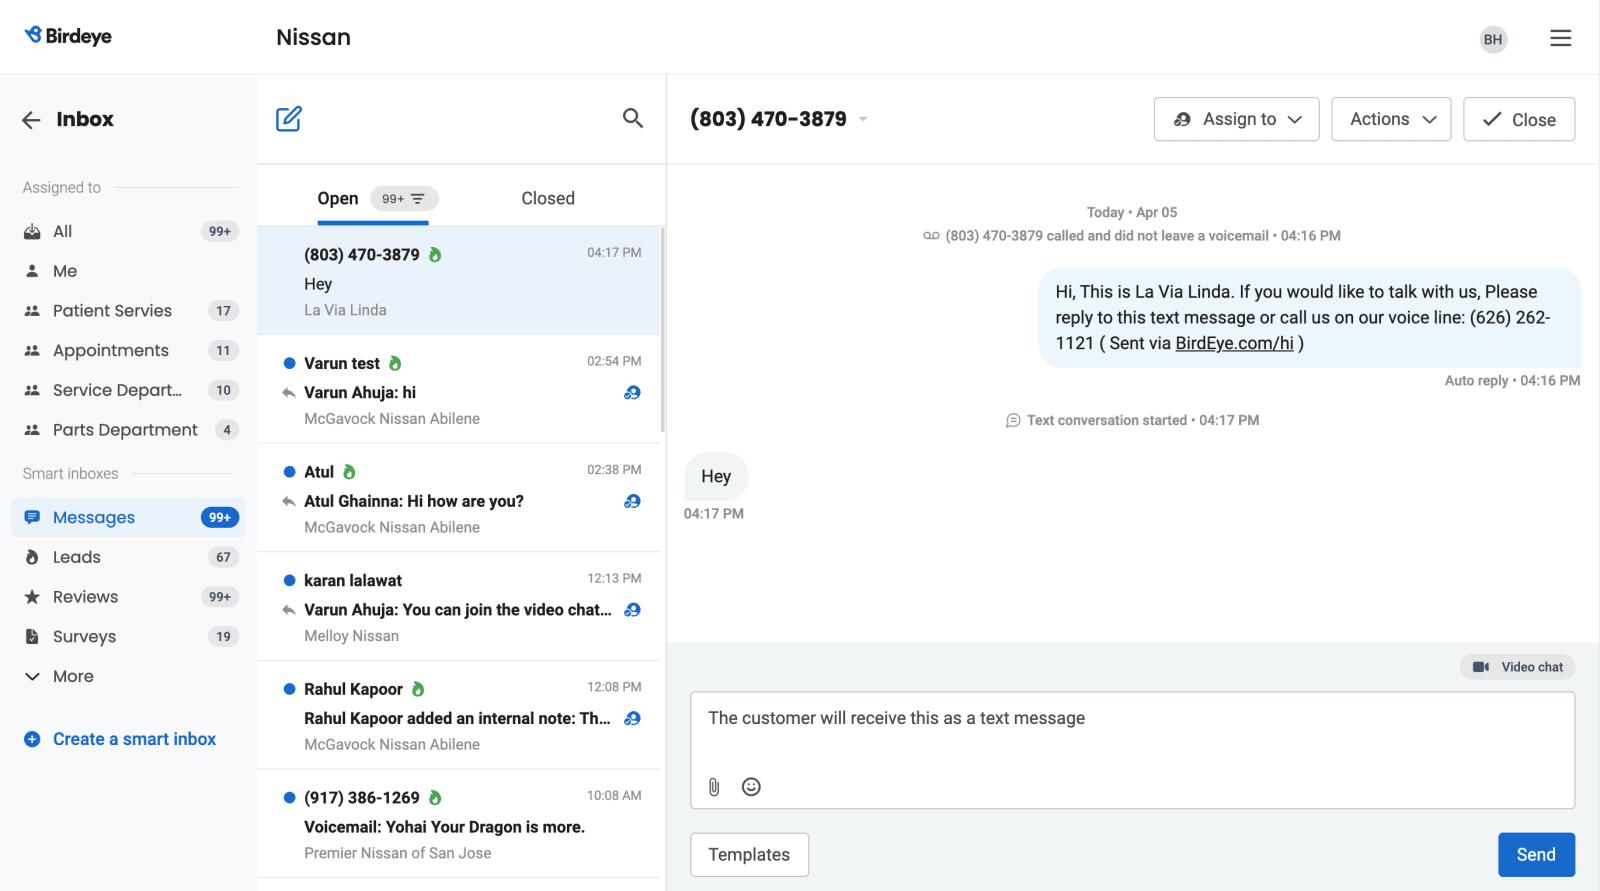 Birdeye unified inbox